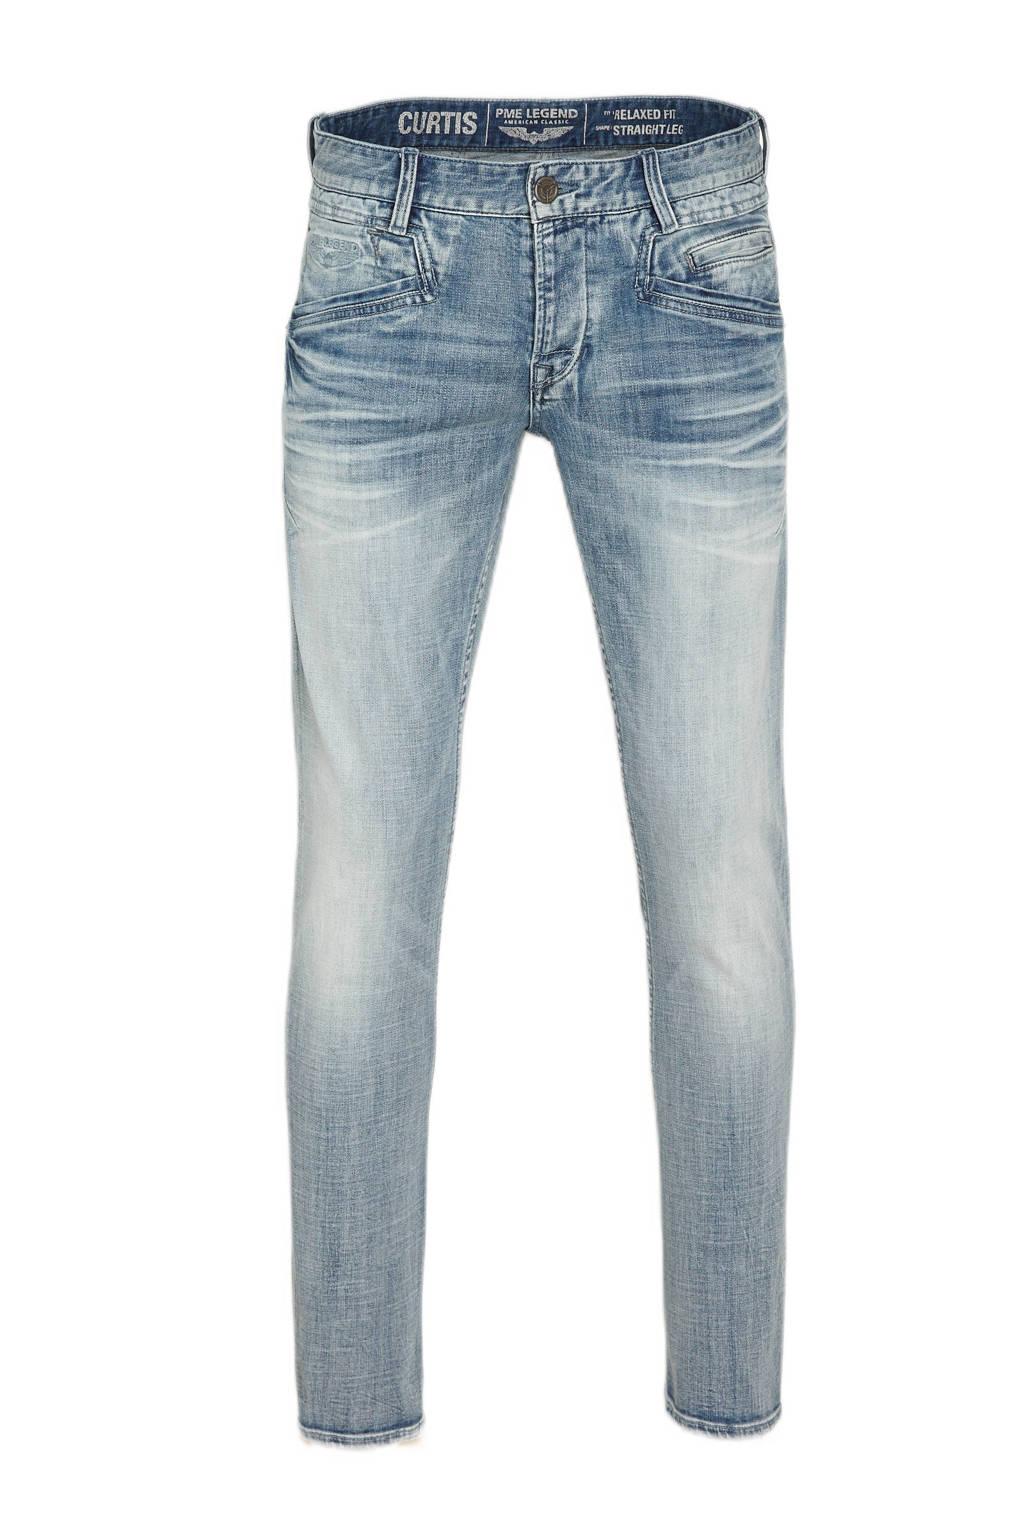 PME Legend straight fit jeans Curtis light blue, Light Blue